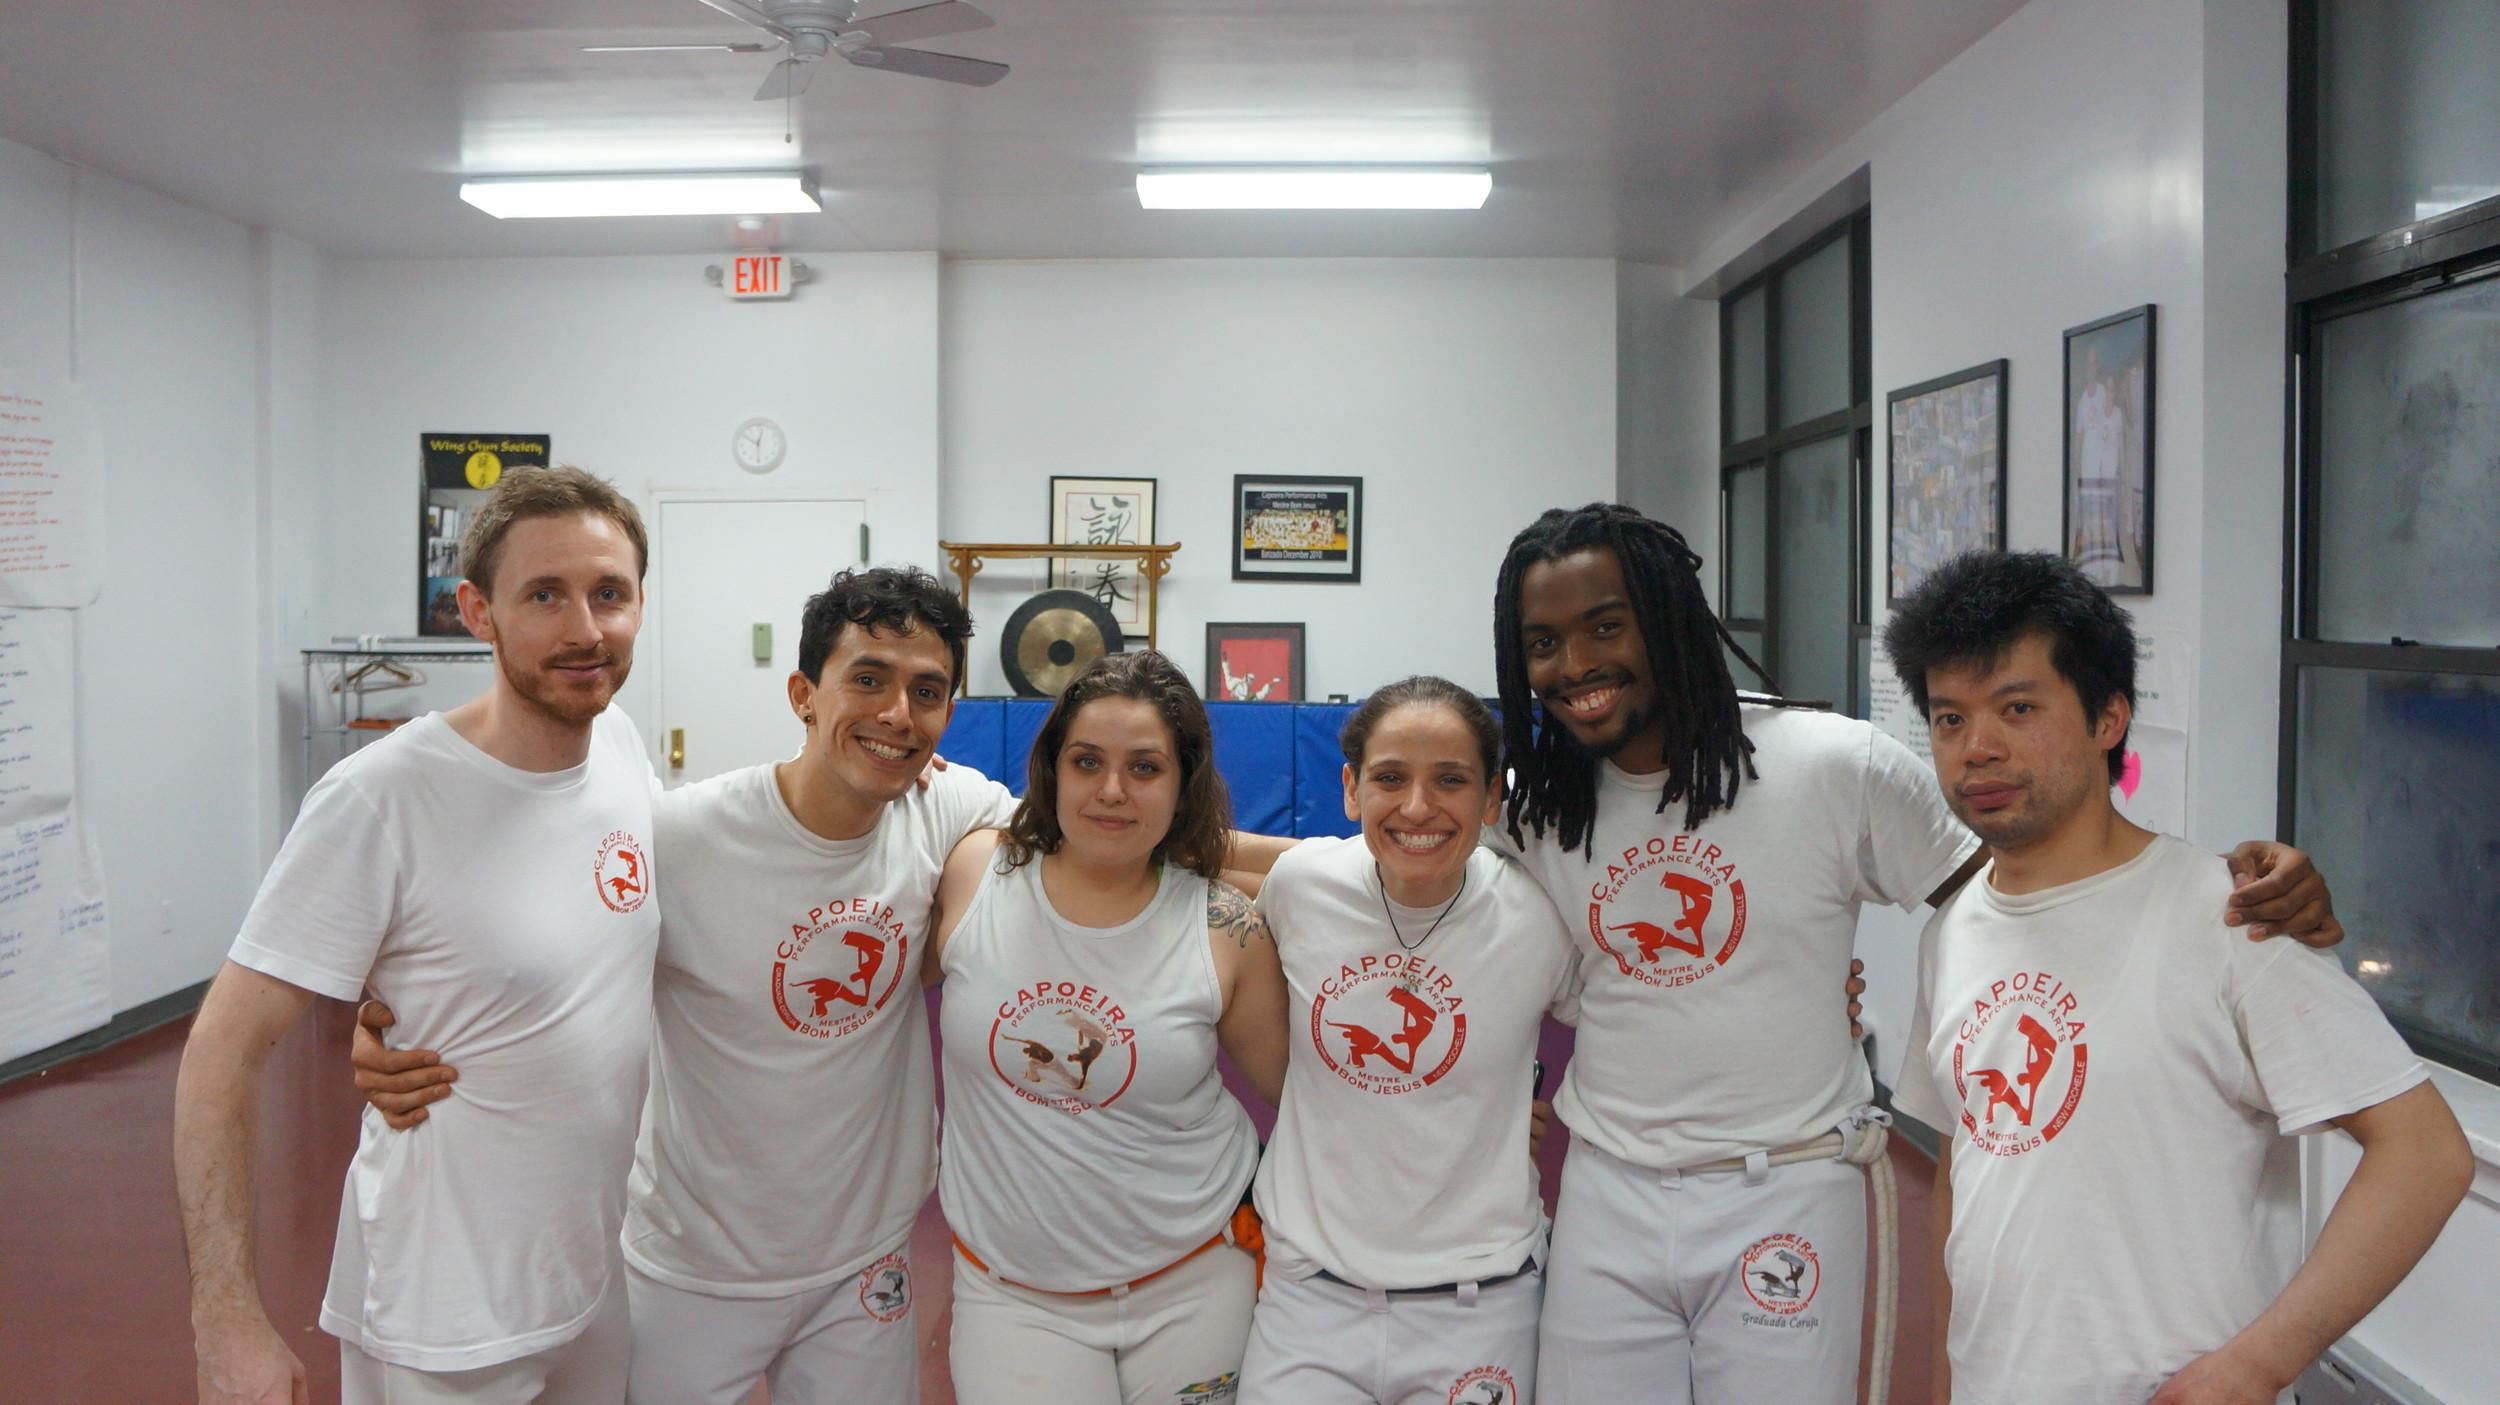 My Crew.JPG